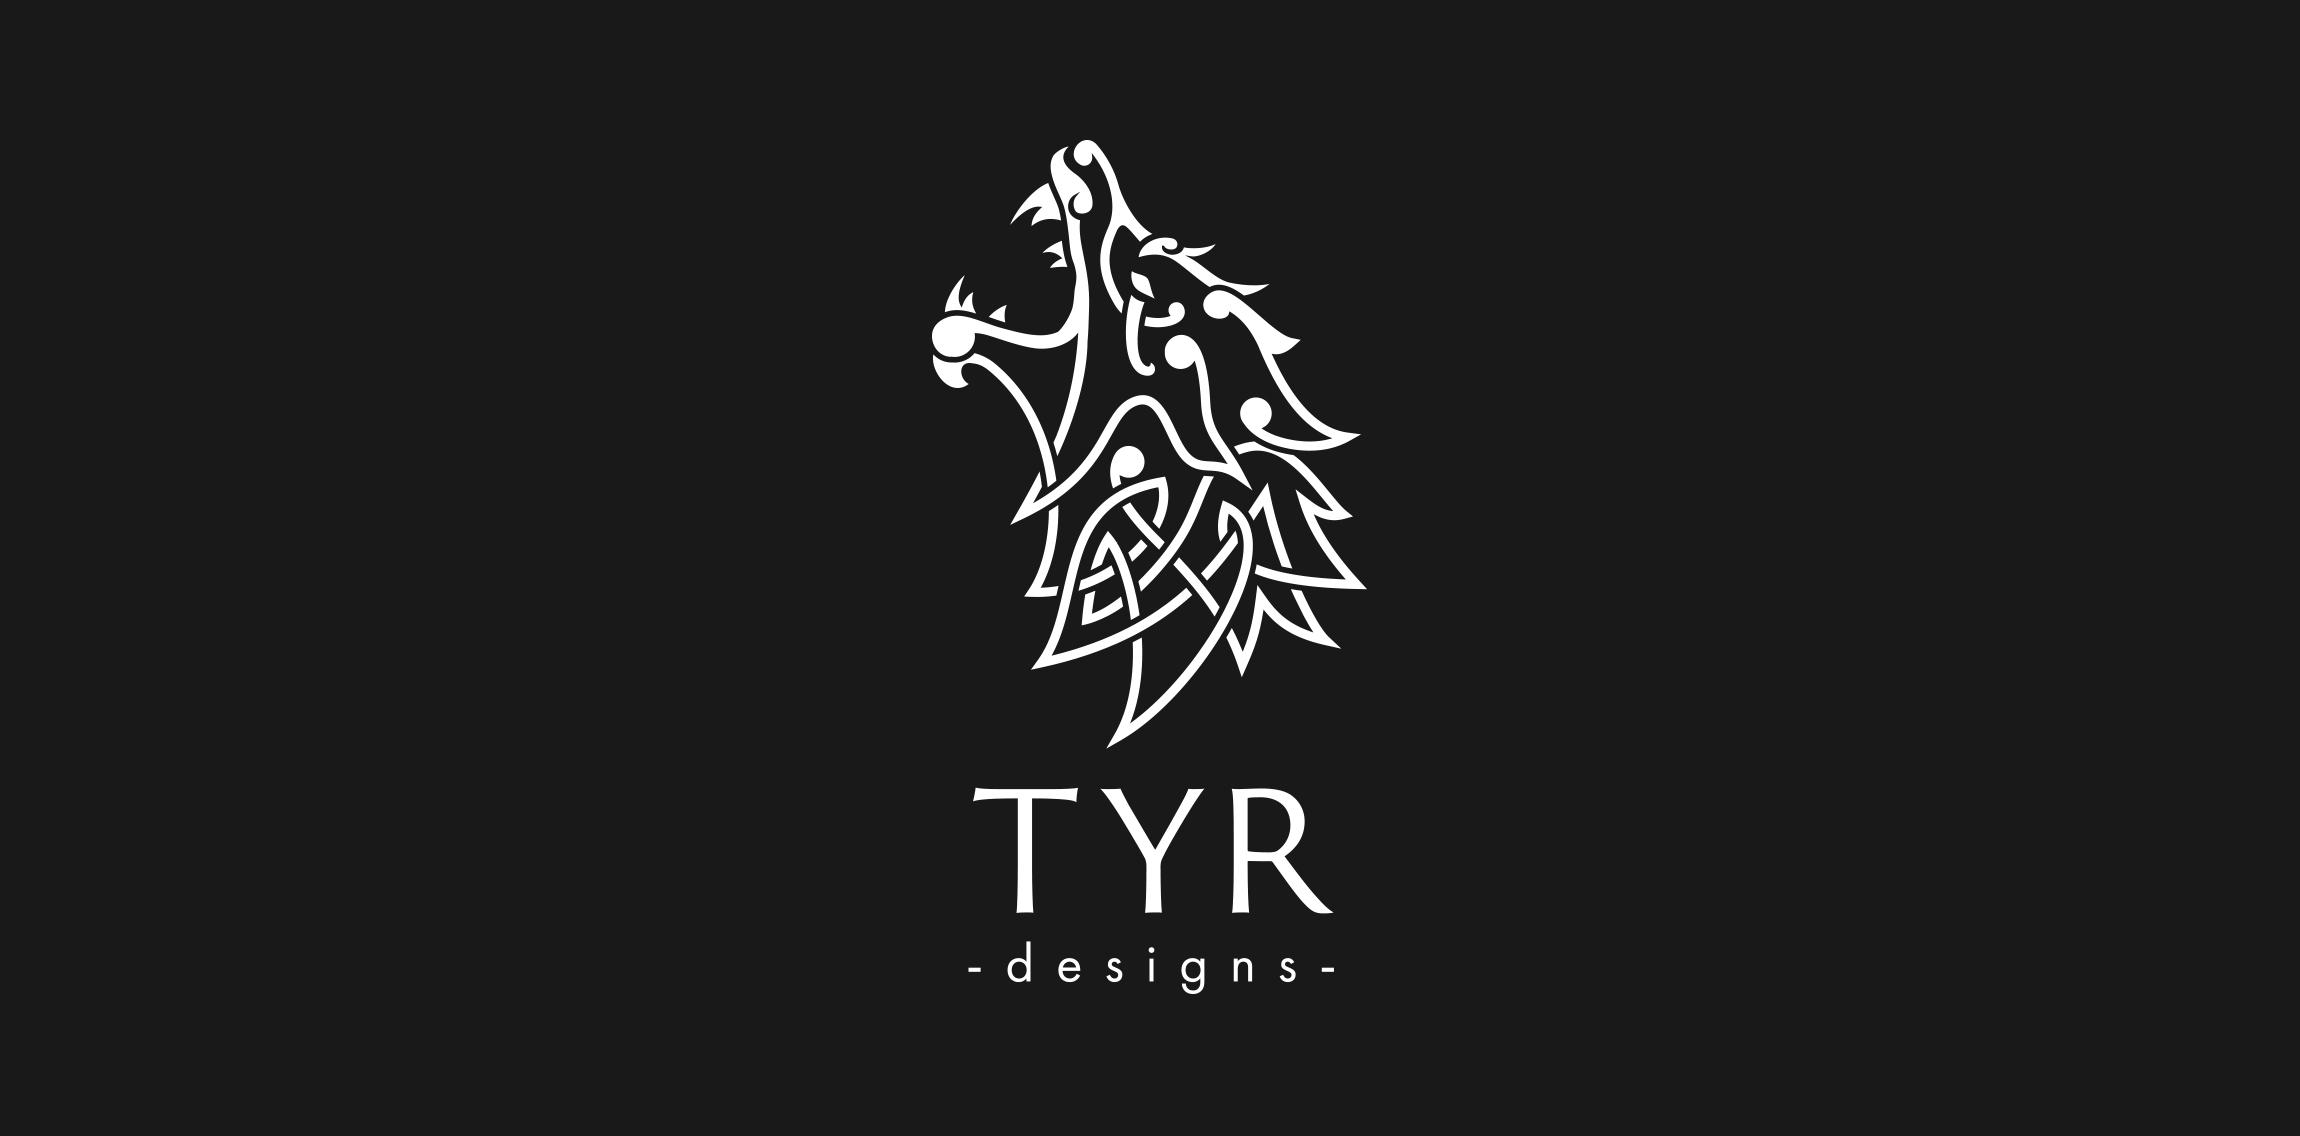 Tyr Designs